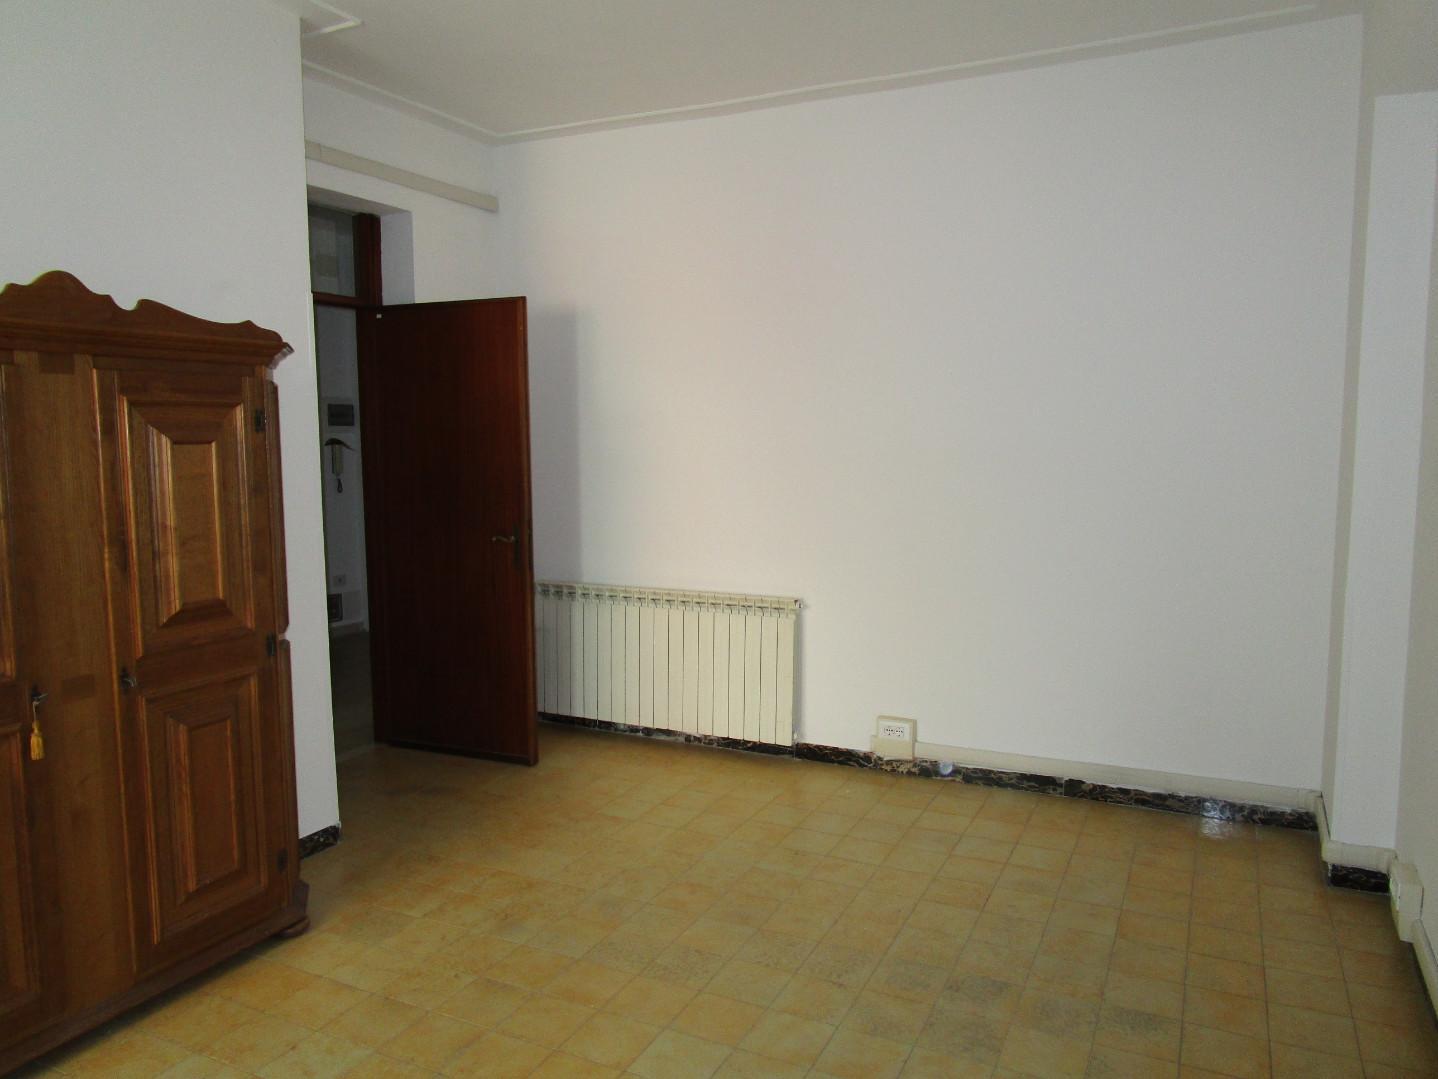 Appartamento in affitto a Centro, Carrara